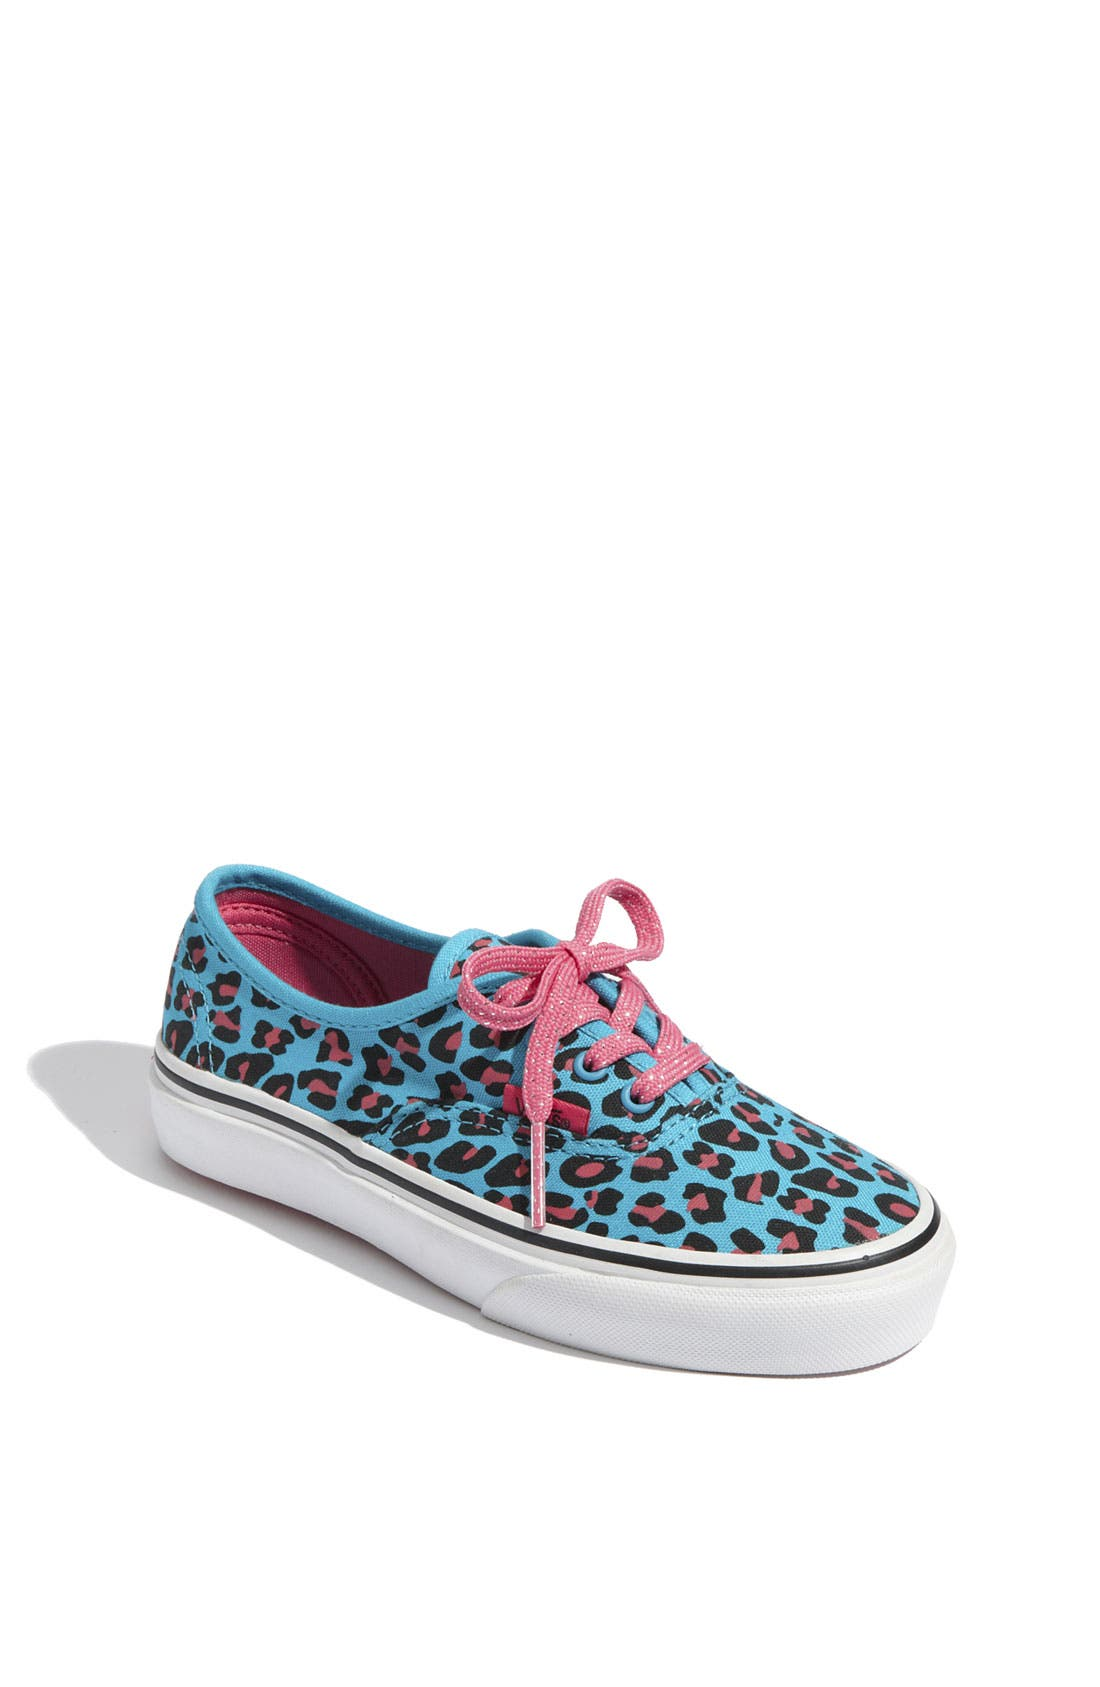 Main Image - Vans 'Cheetah' Sneaker (Toddler, Little Kid & Big Kid)